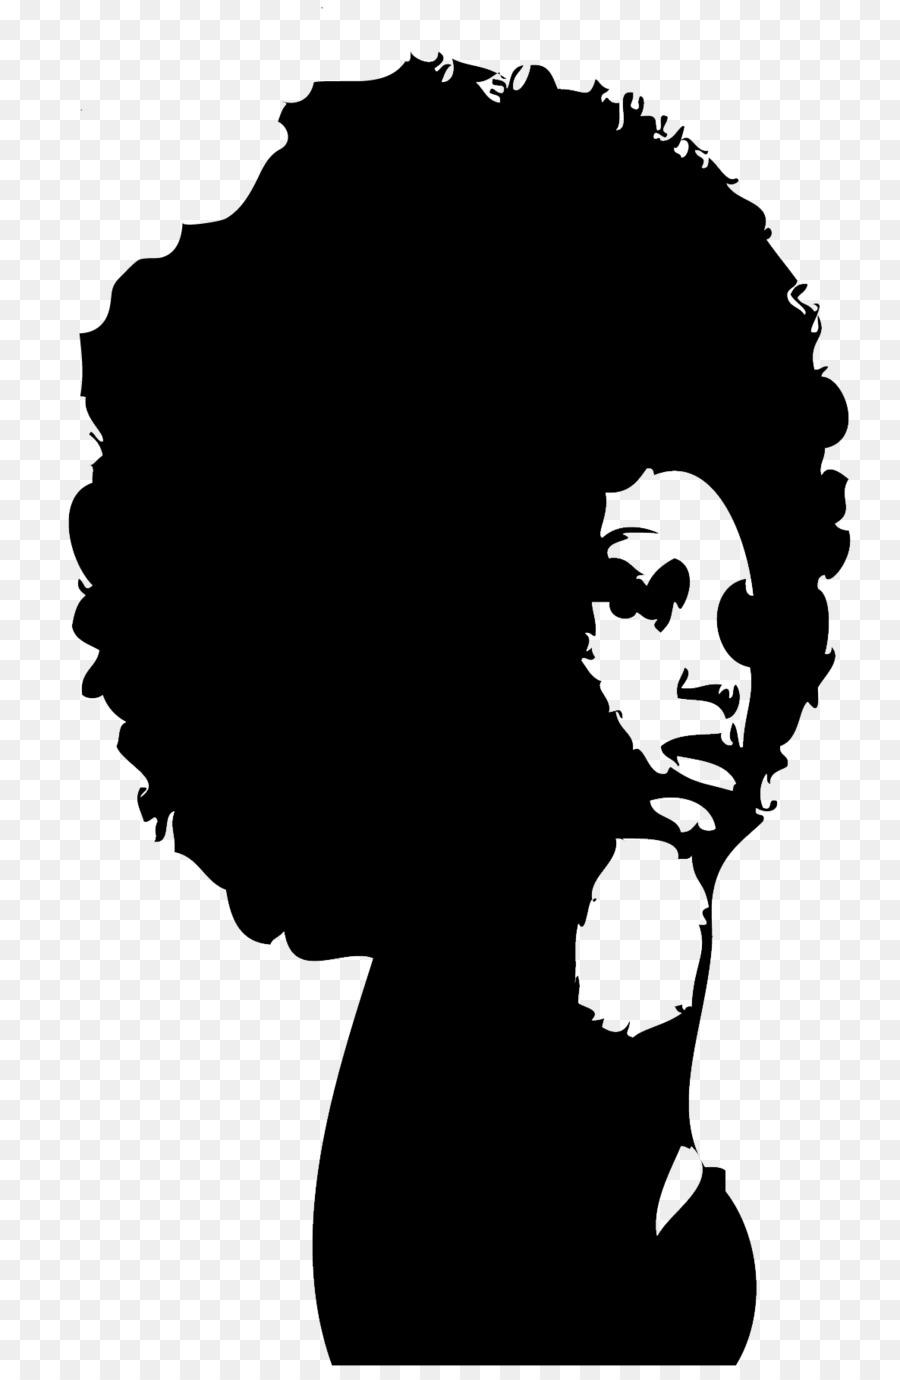 Black silhouette clipart clip download Woman Cartoon clipart - Black, Silhouette, Woman, transparent clip art clip download